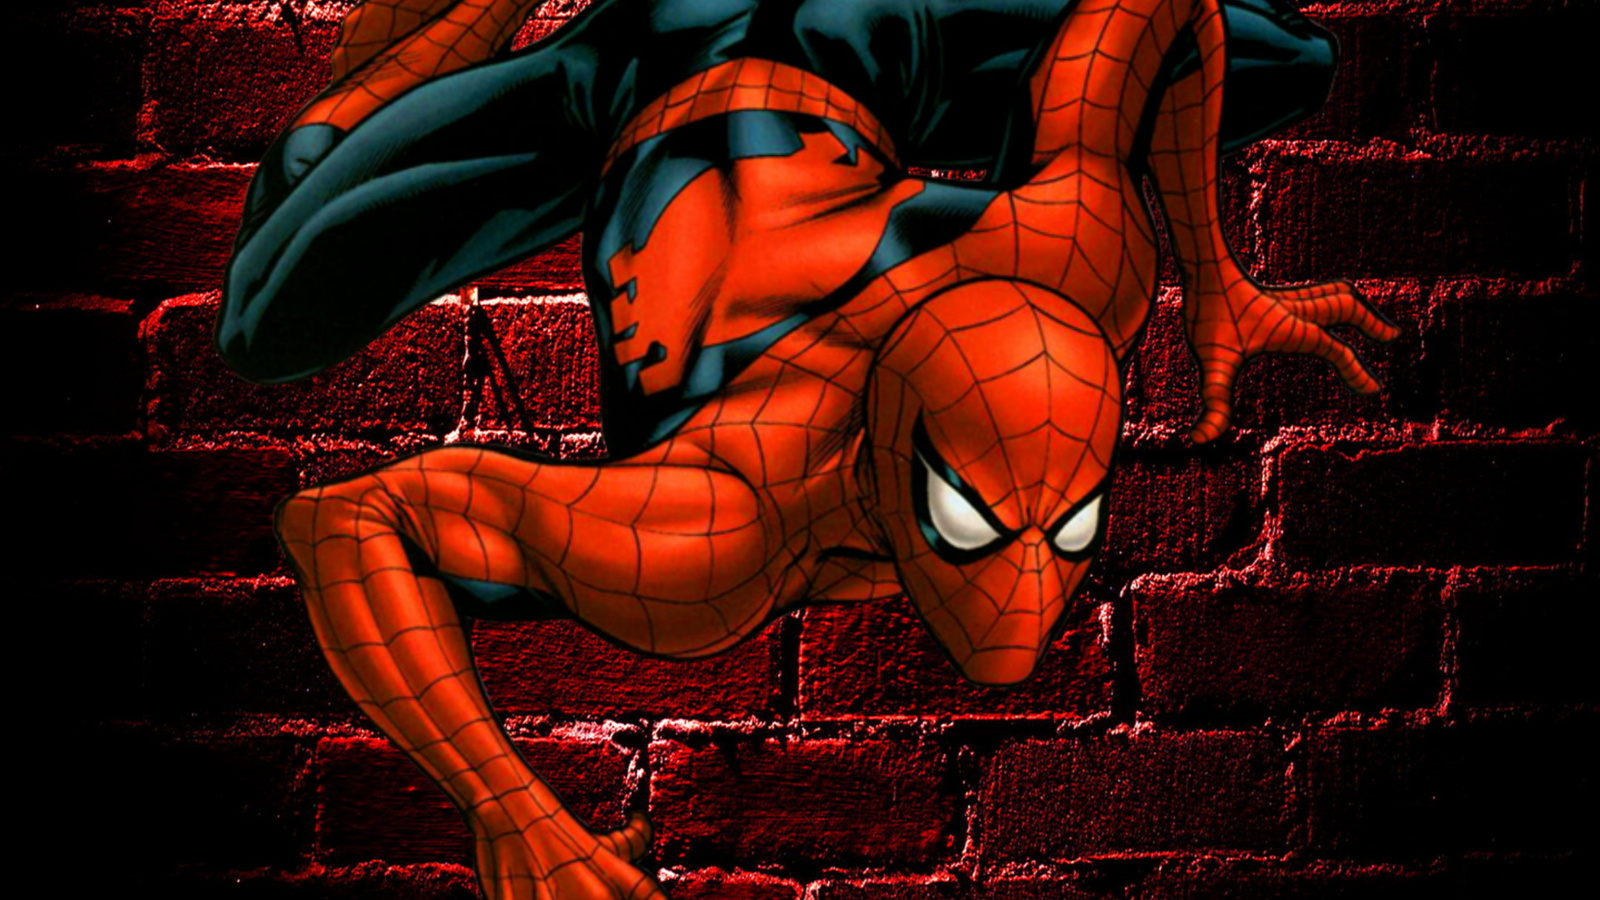 1600x900 hd desktop wallpaper spiderman wallpapersafari for Fondos de spiderman